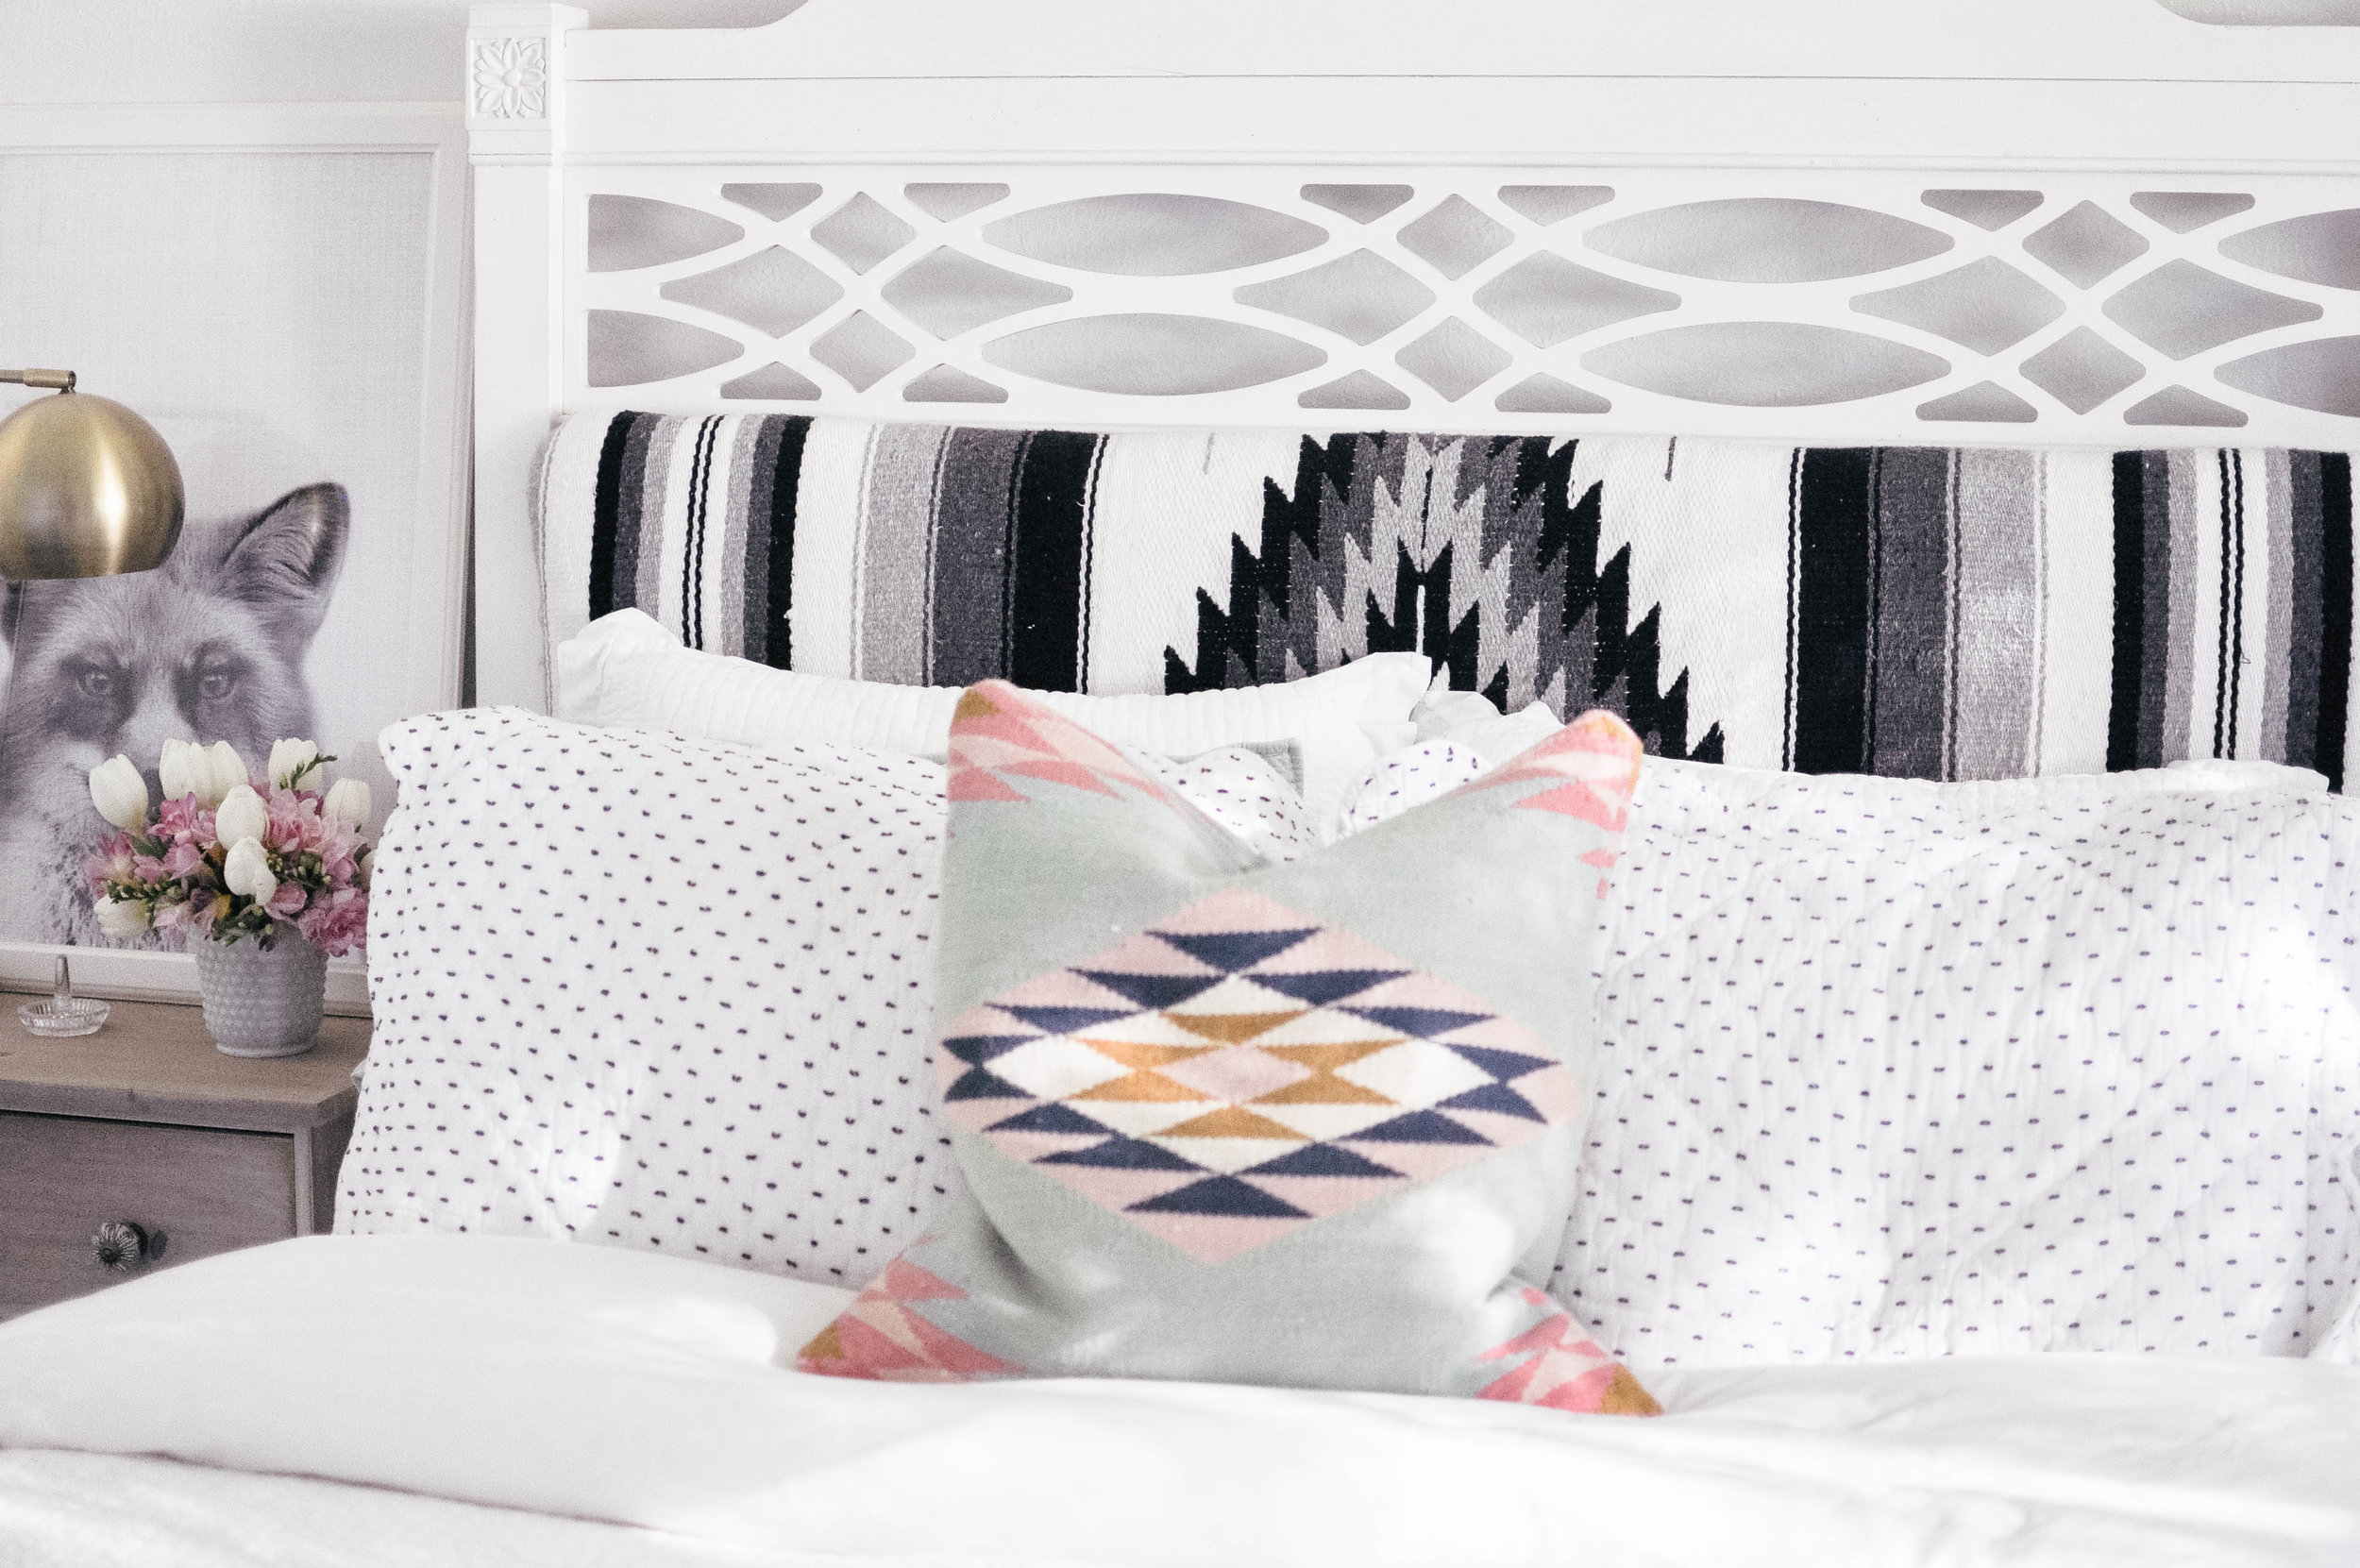 DIY-upholstered-headboard-room-decor.jpg